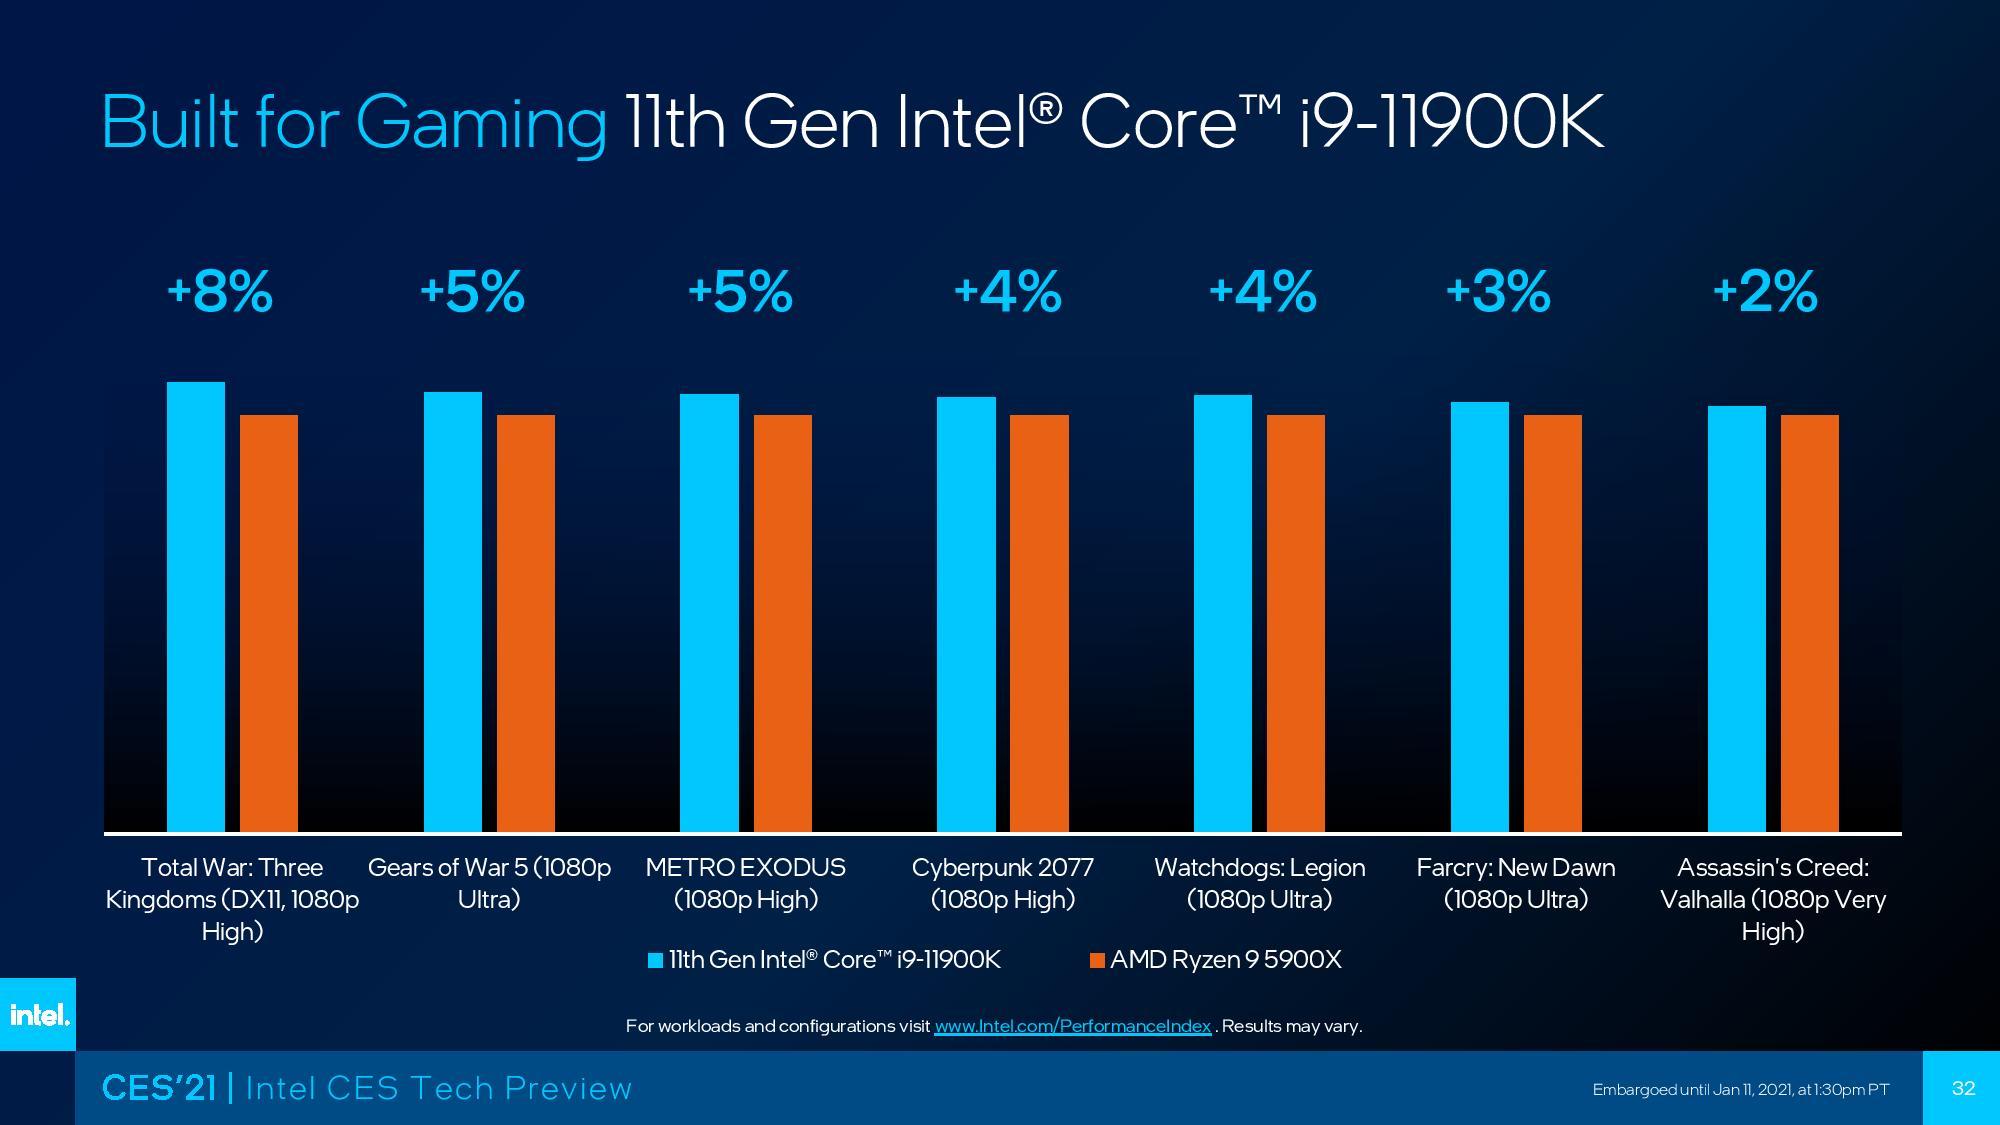 Intel Rocket Lake-S Core i9-11900K vs AMD Ryzen 9 5900X gaming benchmarks-1